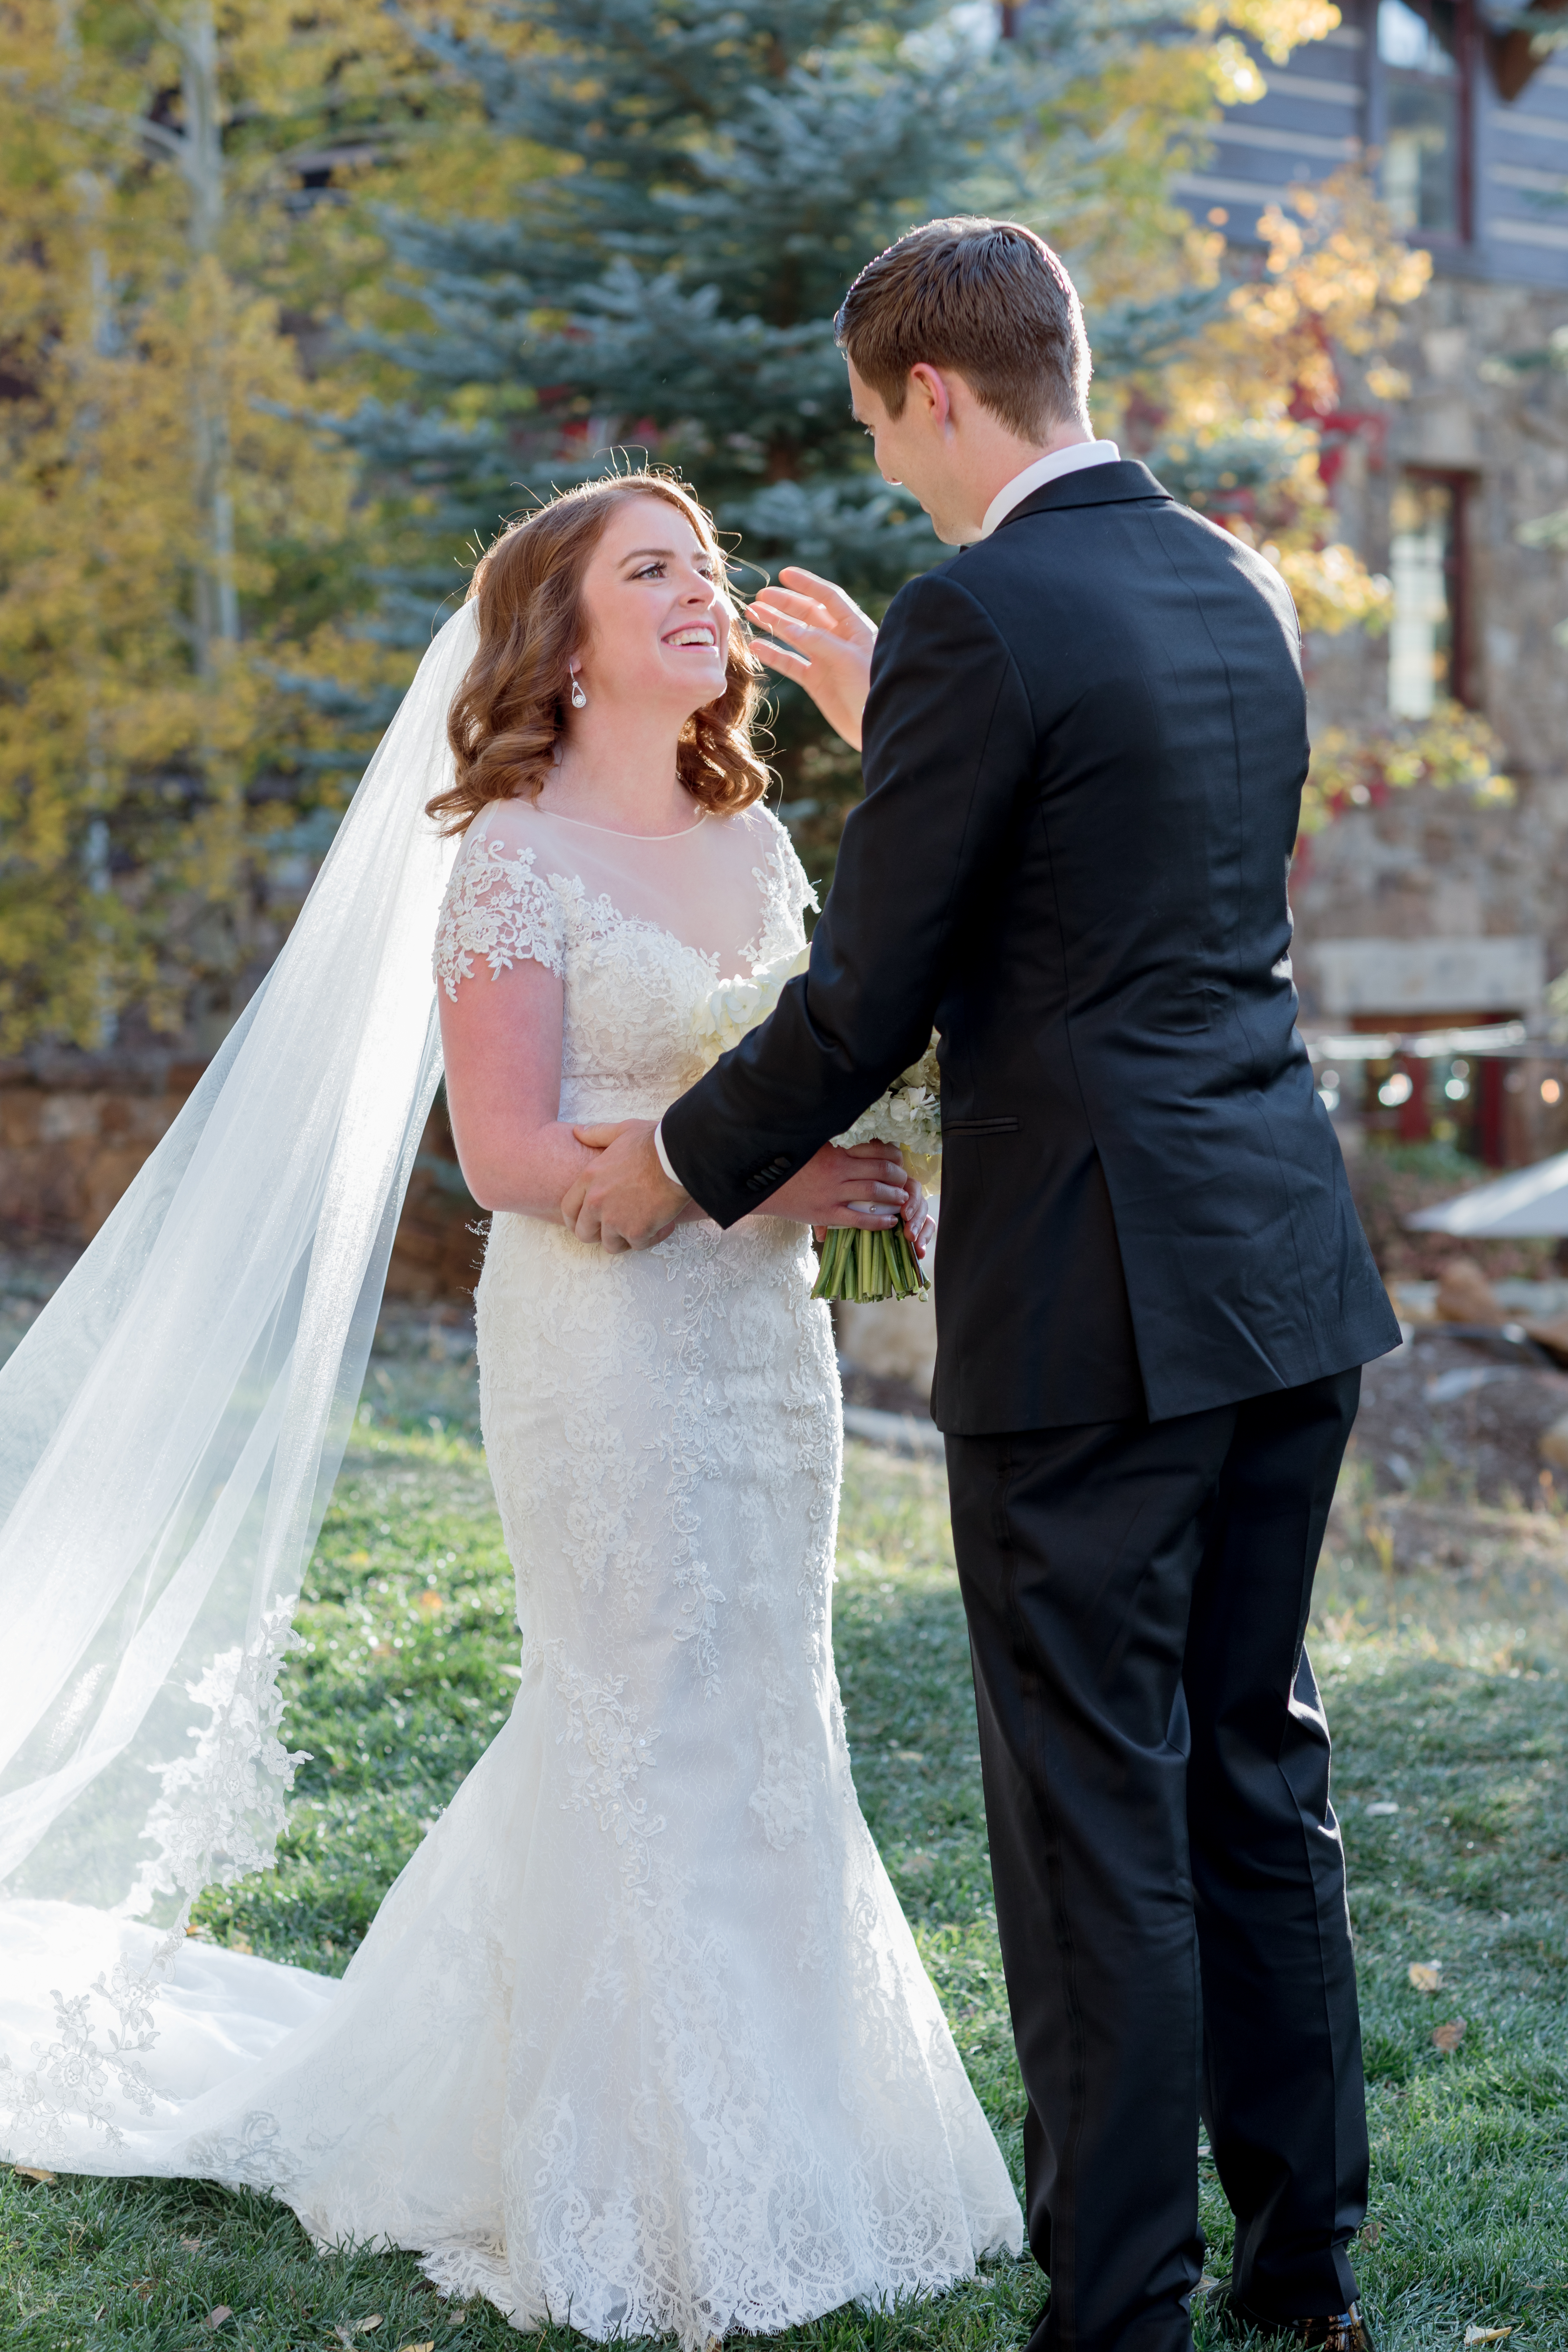 Ritz-Carlton-Bachelor-Gulch-Beaver-Creek-Colorado-Fall-Wedding-Bride-Groom-First-Look